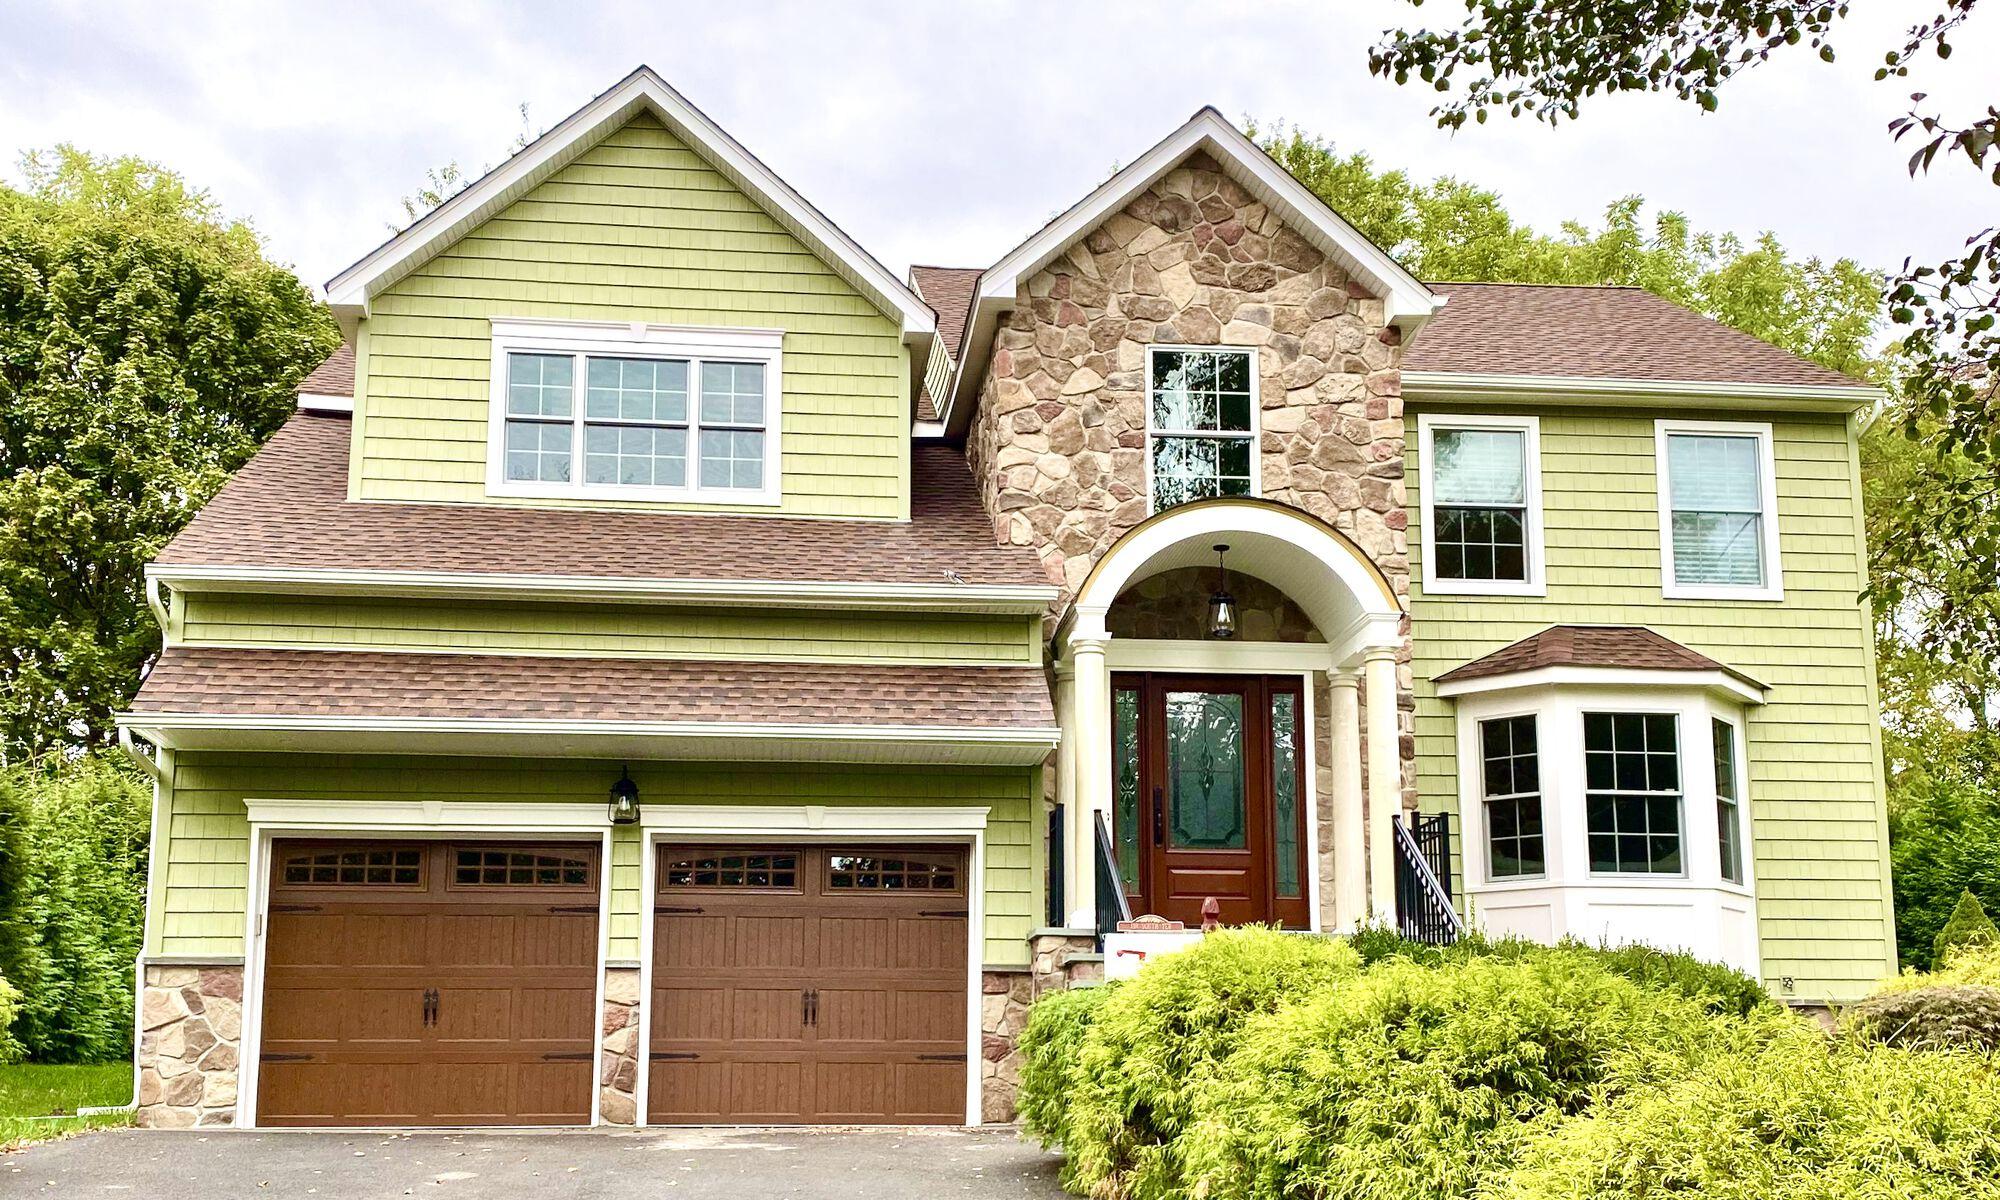 Pelican Bay Siding, GAF HD Roofing, New Portico, Pella Windows _ Doors, General Garage Doors, Boral Stone Steps in Boonton, Morris County NJ